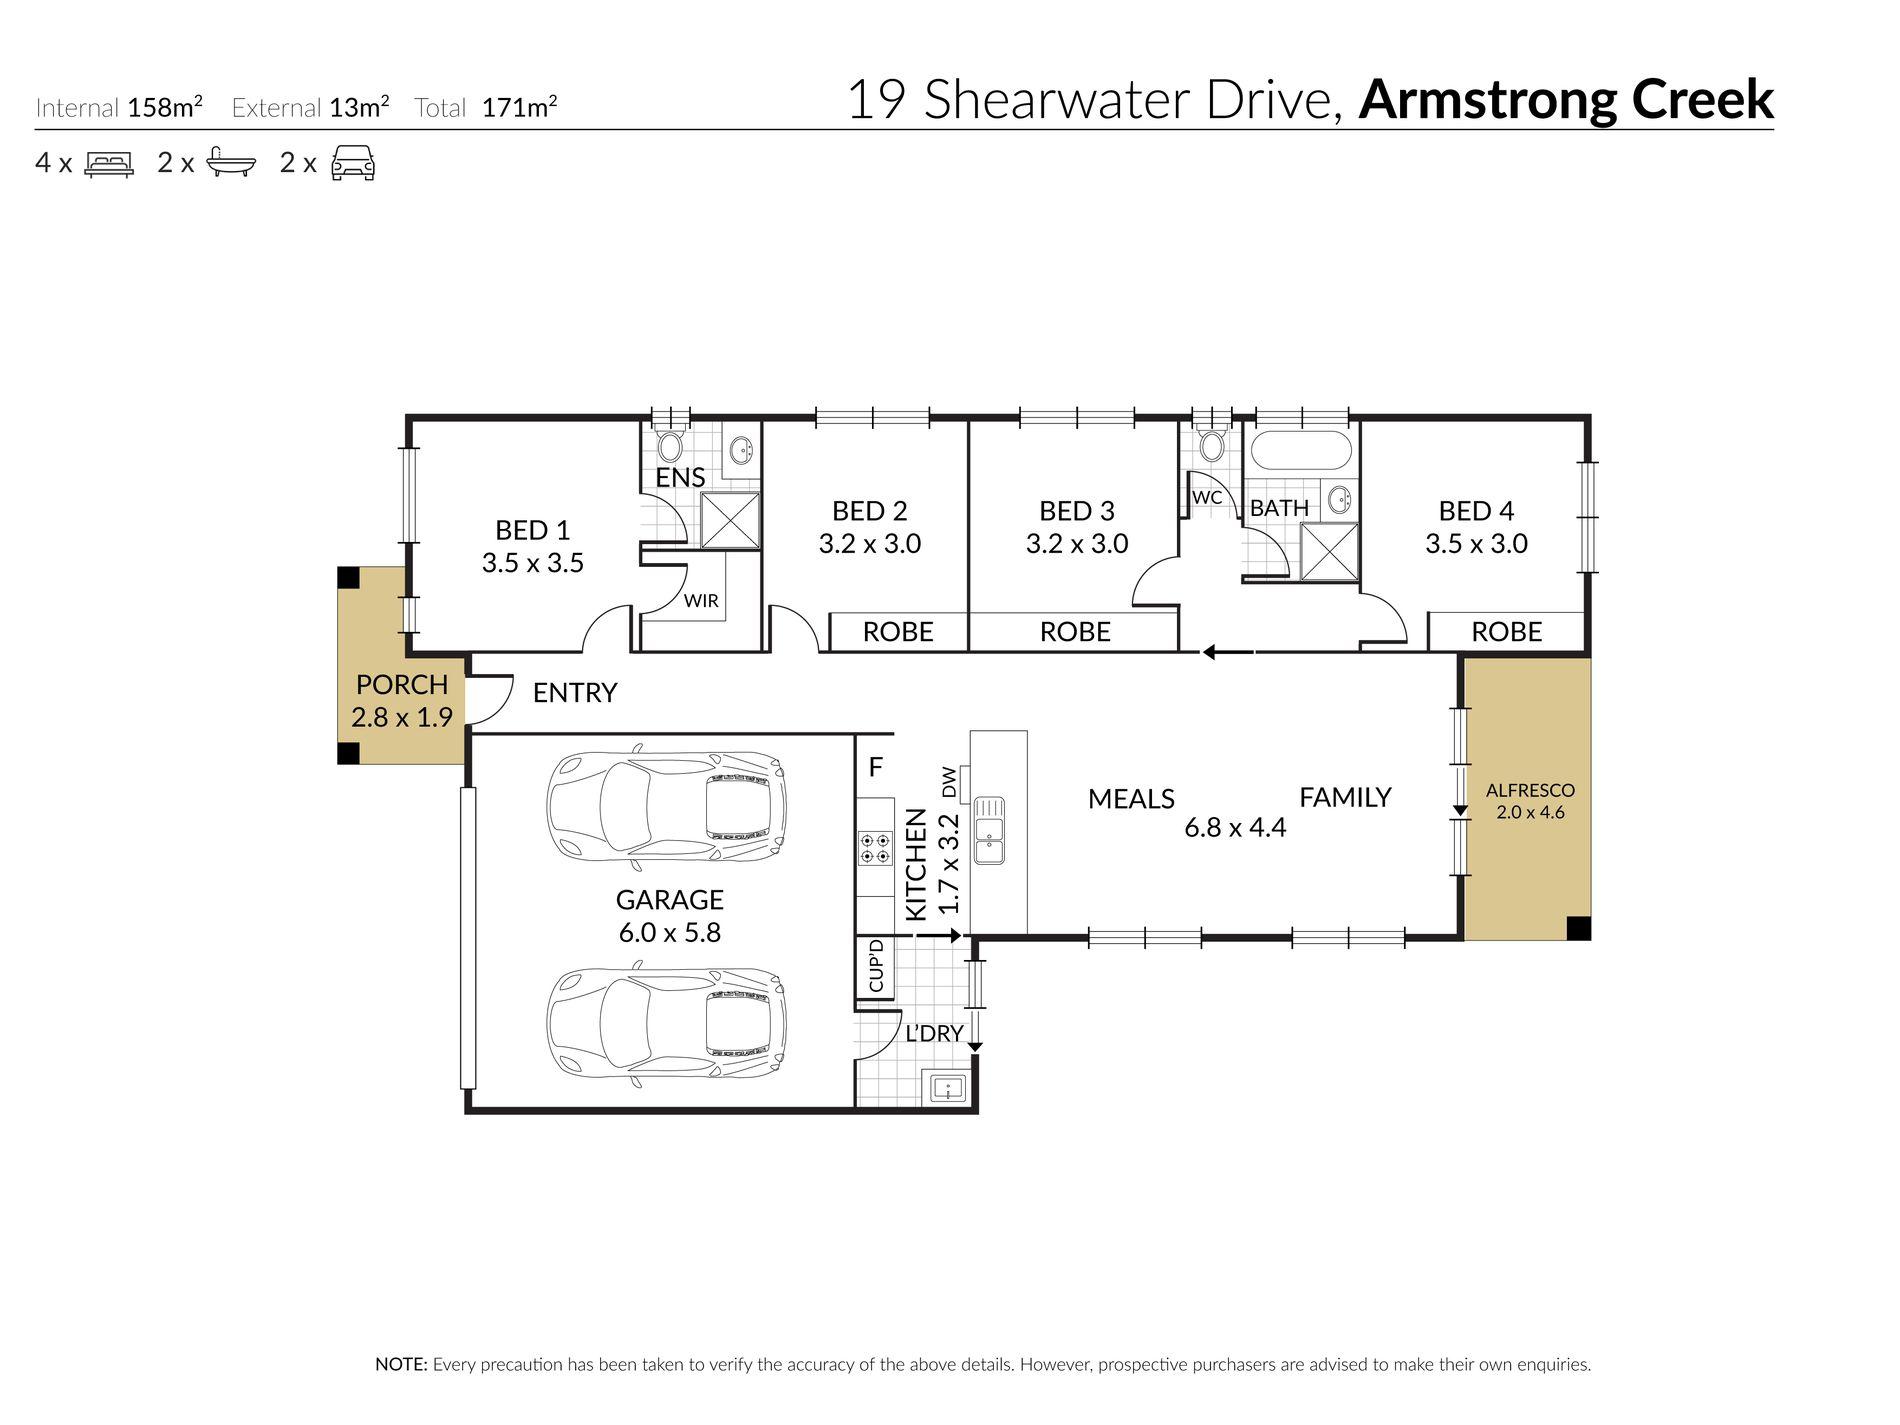 19 Shearwater Drive, Armstrong Creek